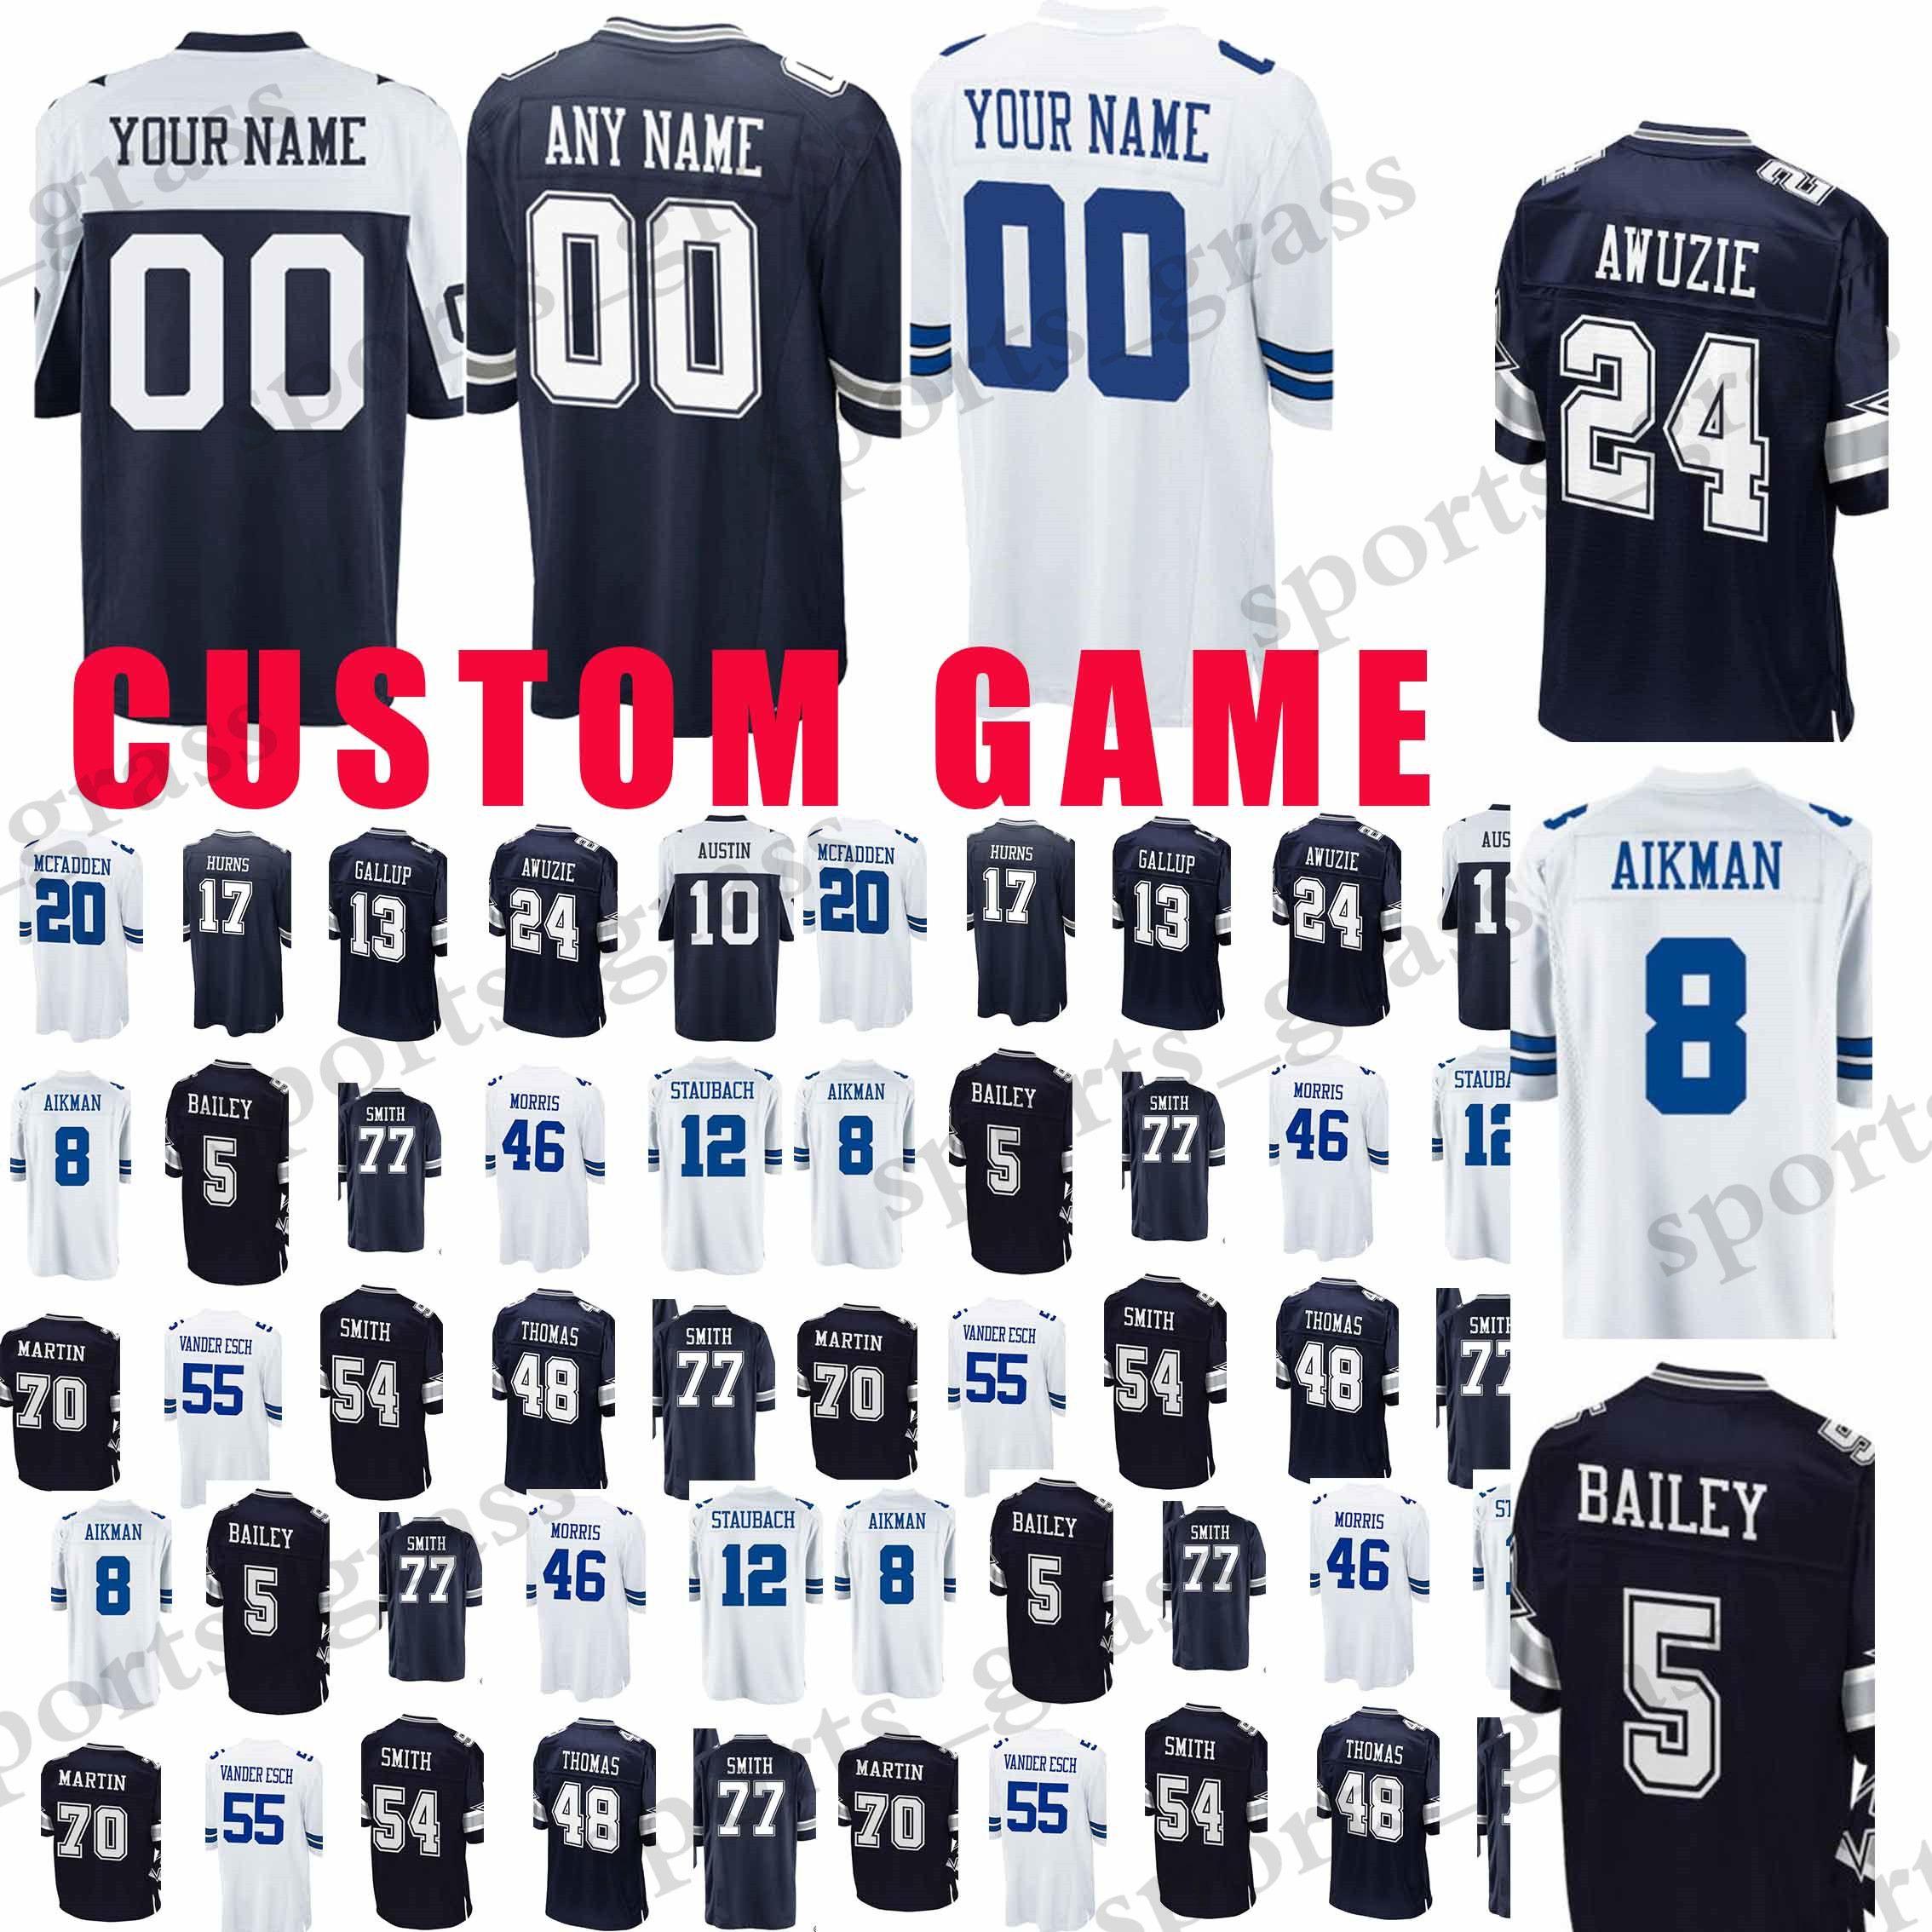 the latest c6f6f 140b4 custom Game Dallas Cowboys Jerseys 19 Brice Butler 90 DeMarcus Lawrence 5  Dan Bailey 20 McFadden 48 Johnston 54 Smith Jersey